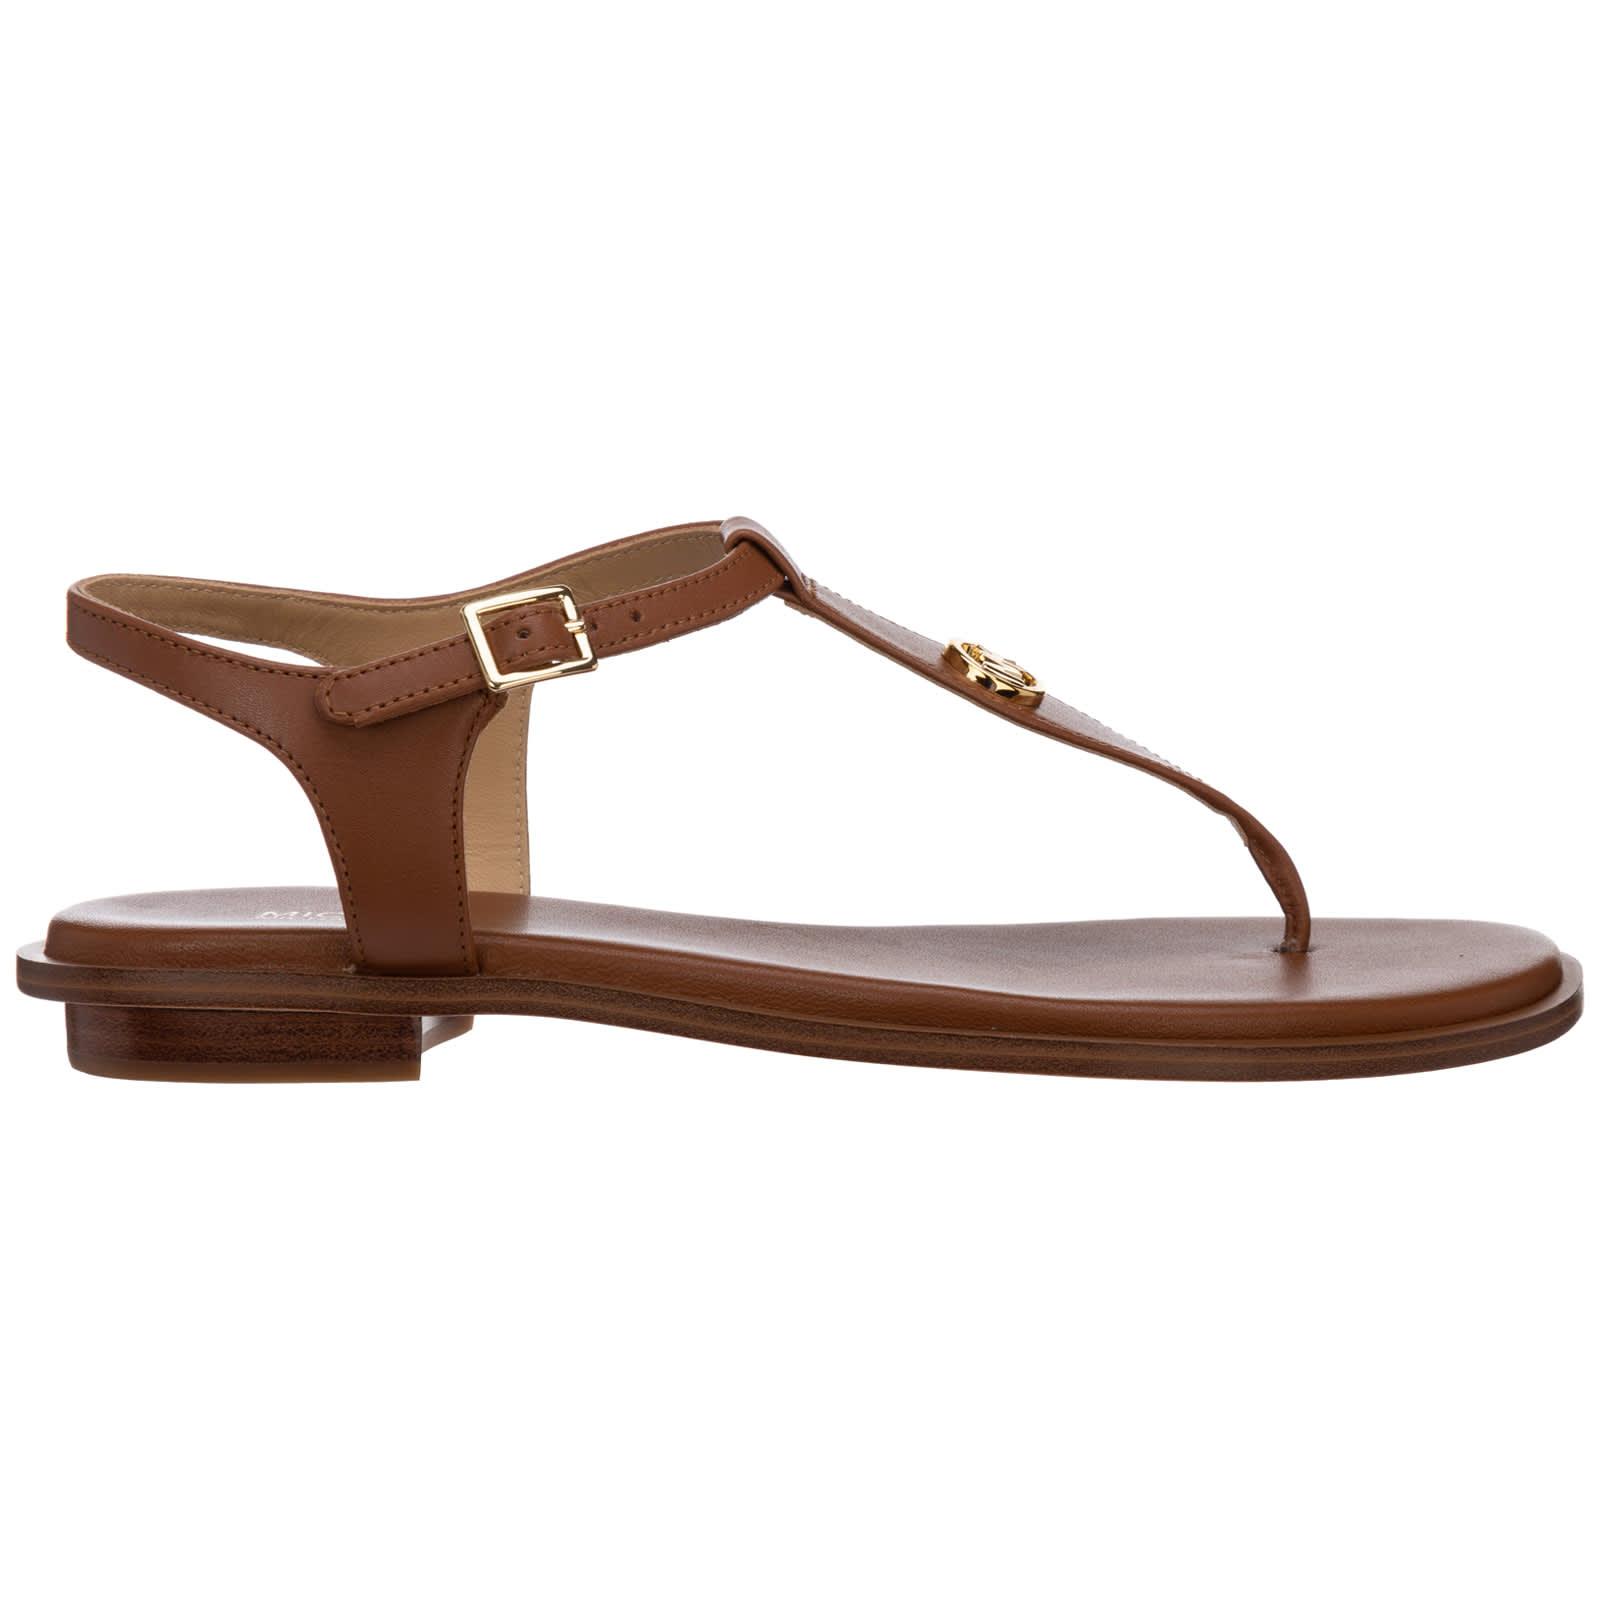 Michael Kors Mallory T-bar Sandals